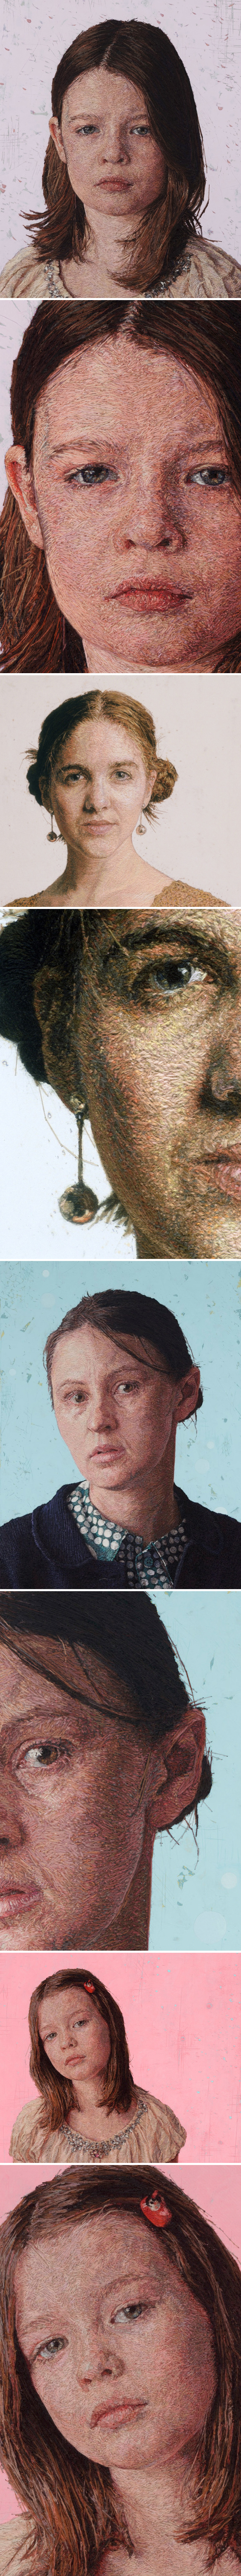 caycezavaglia